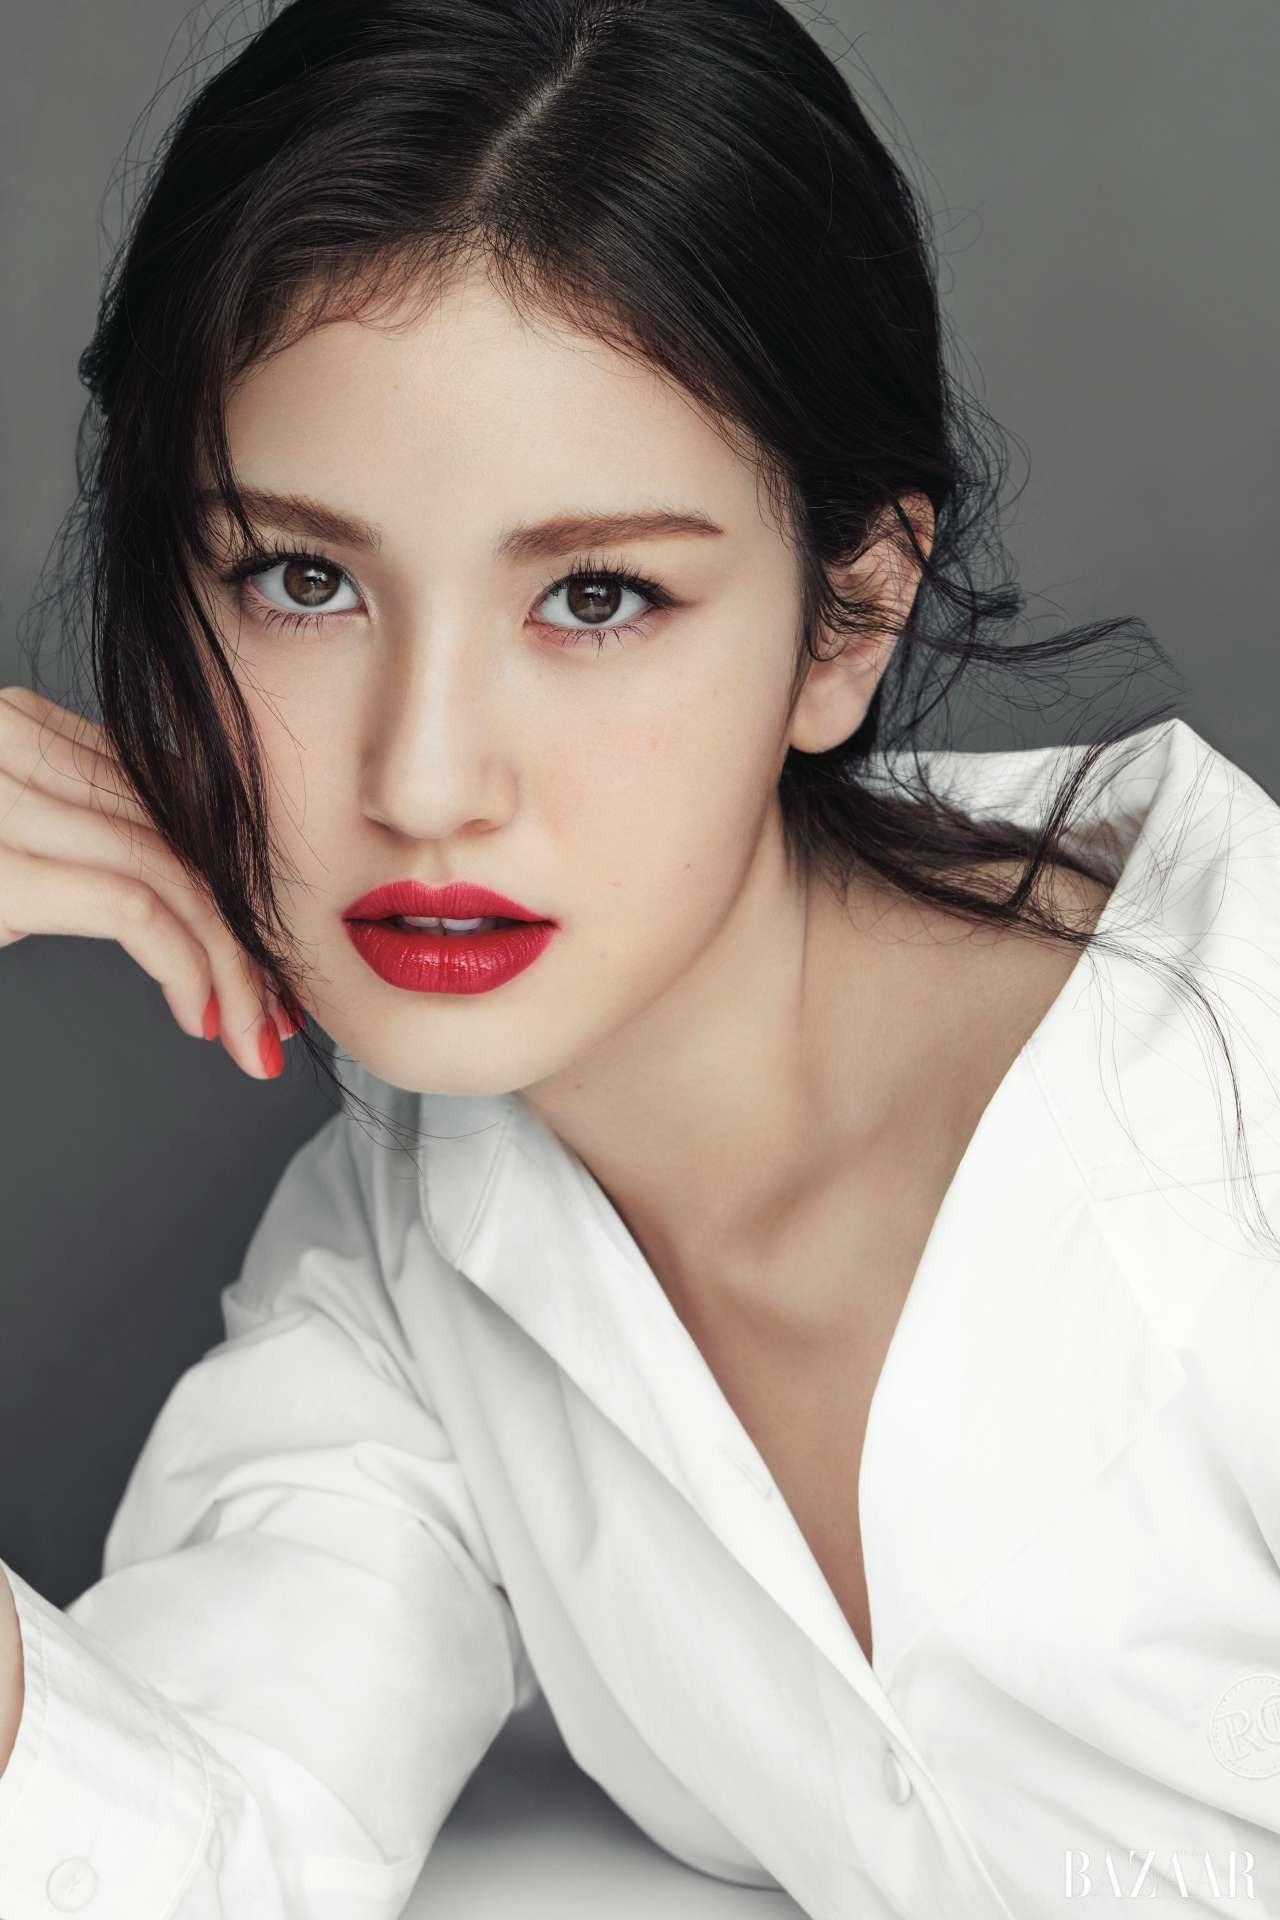 20 Fakta Seputar Jeon So Mi, Sosok Idol Berdarah Blasteran Korea-Belanda